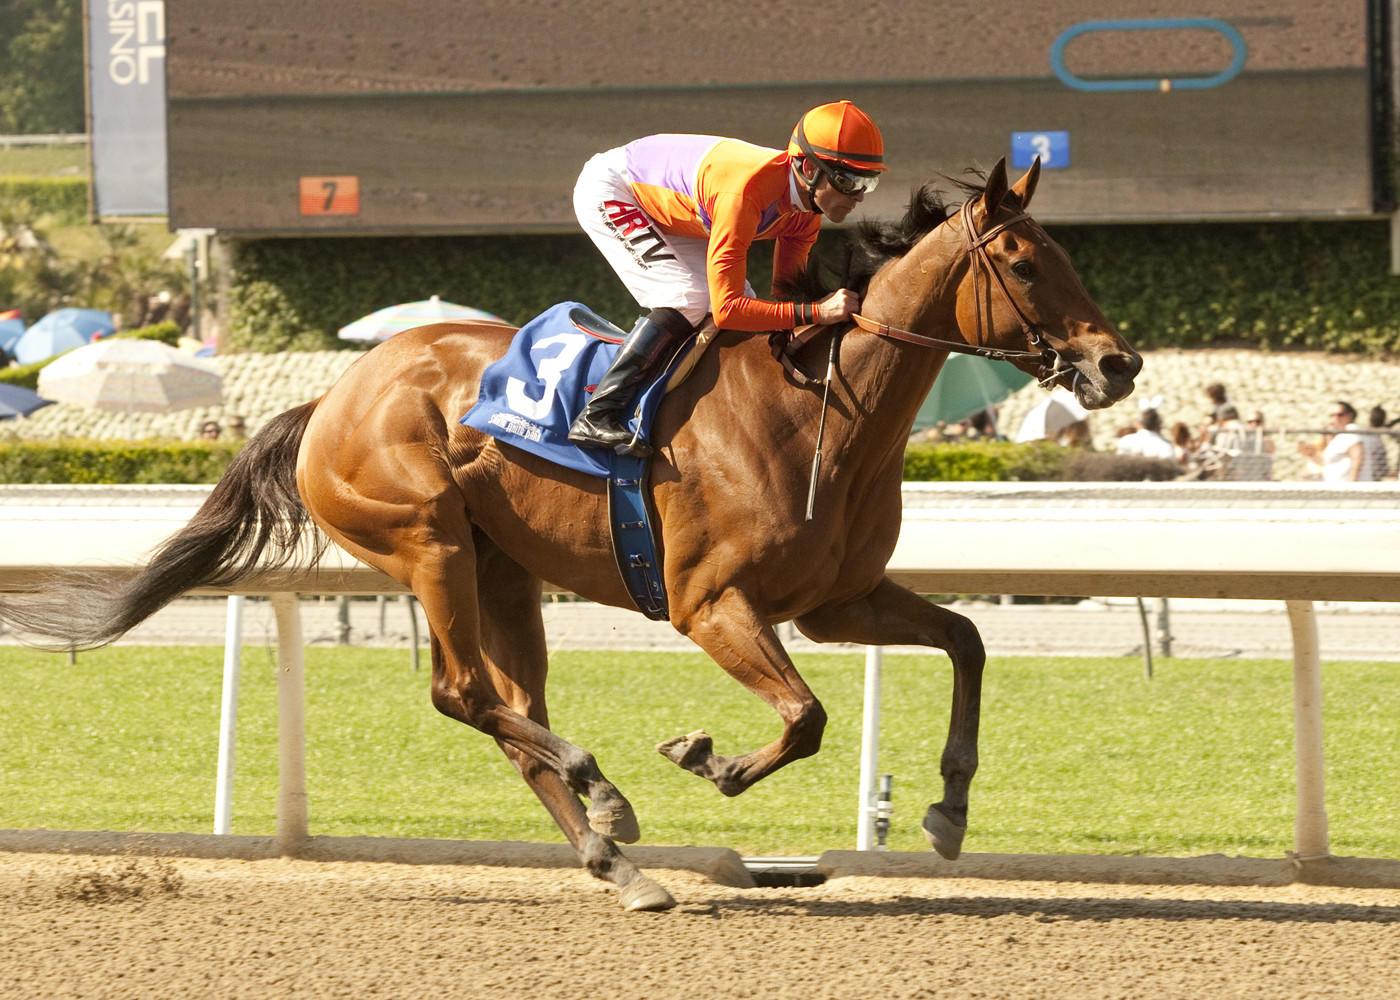 Beholder, with jockey Gary Stevens aboard, wins the $75,000 Santa Lucia Stakes on Sunday at Santa Anita Park.